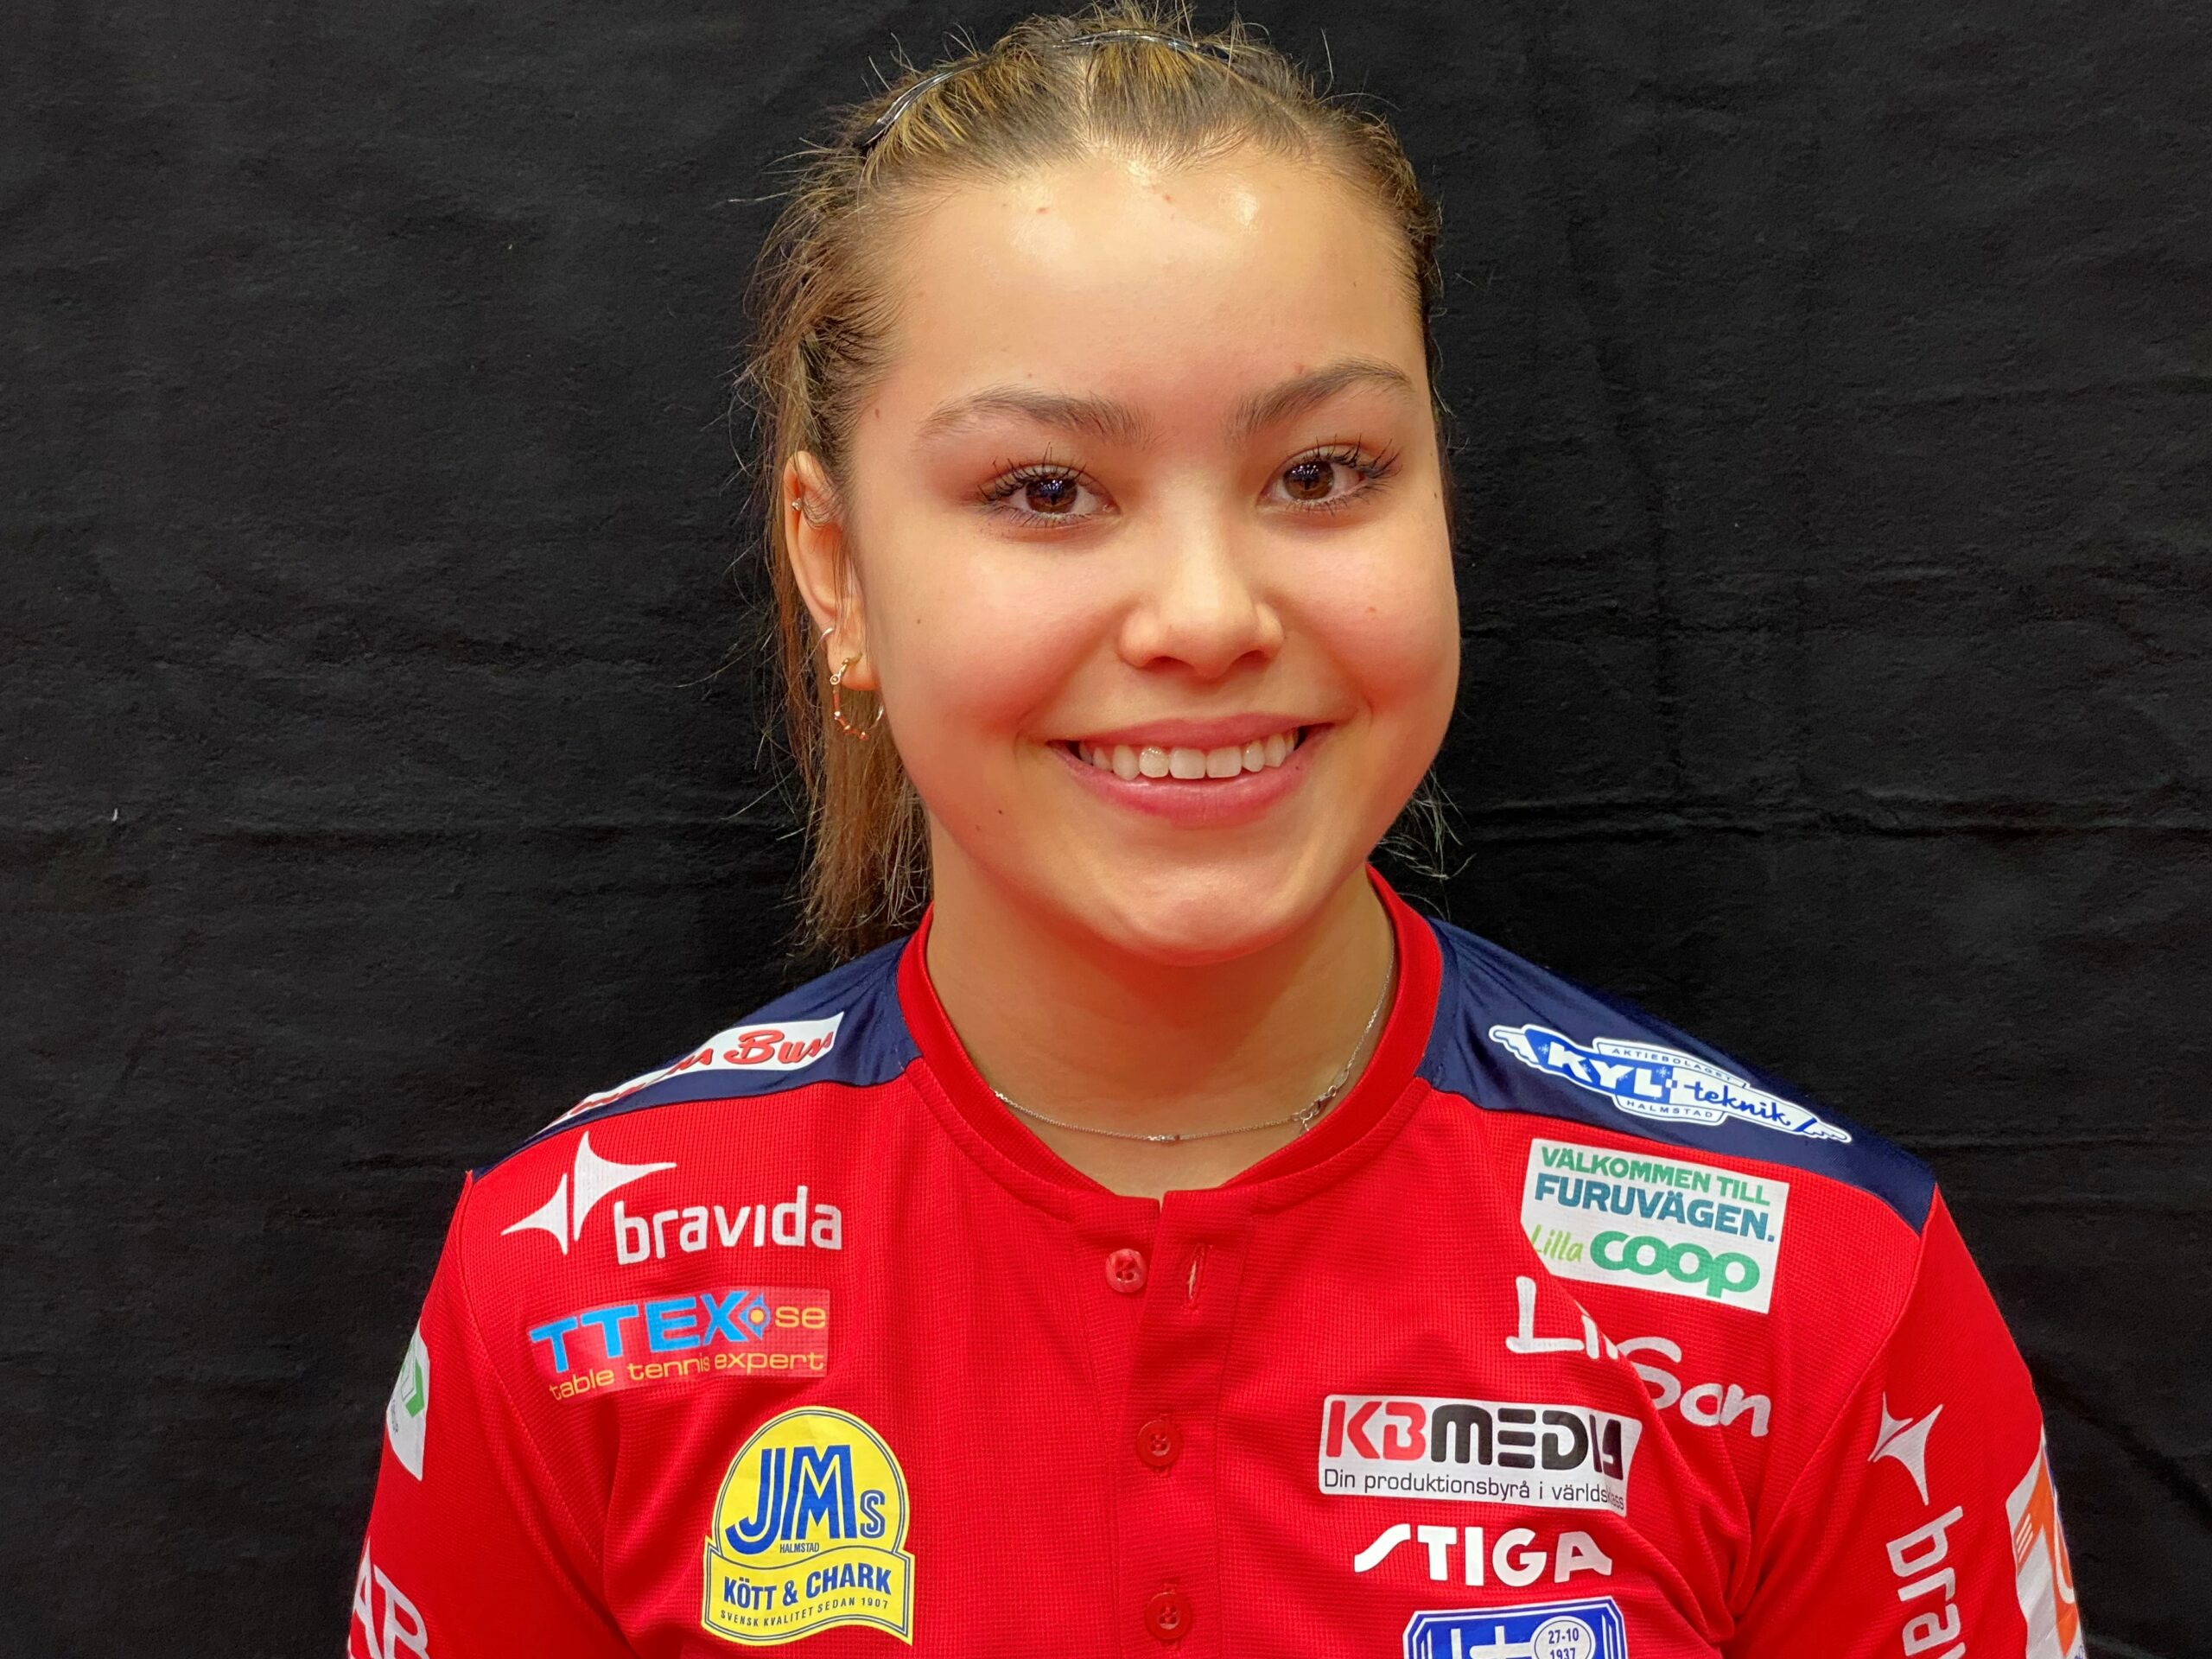 Martine Toftaker